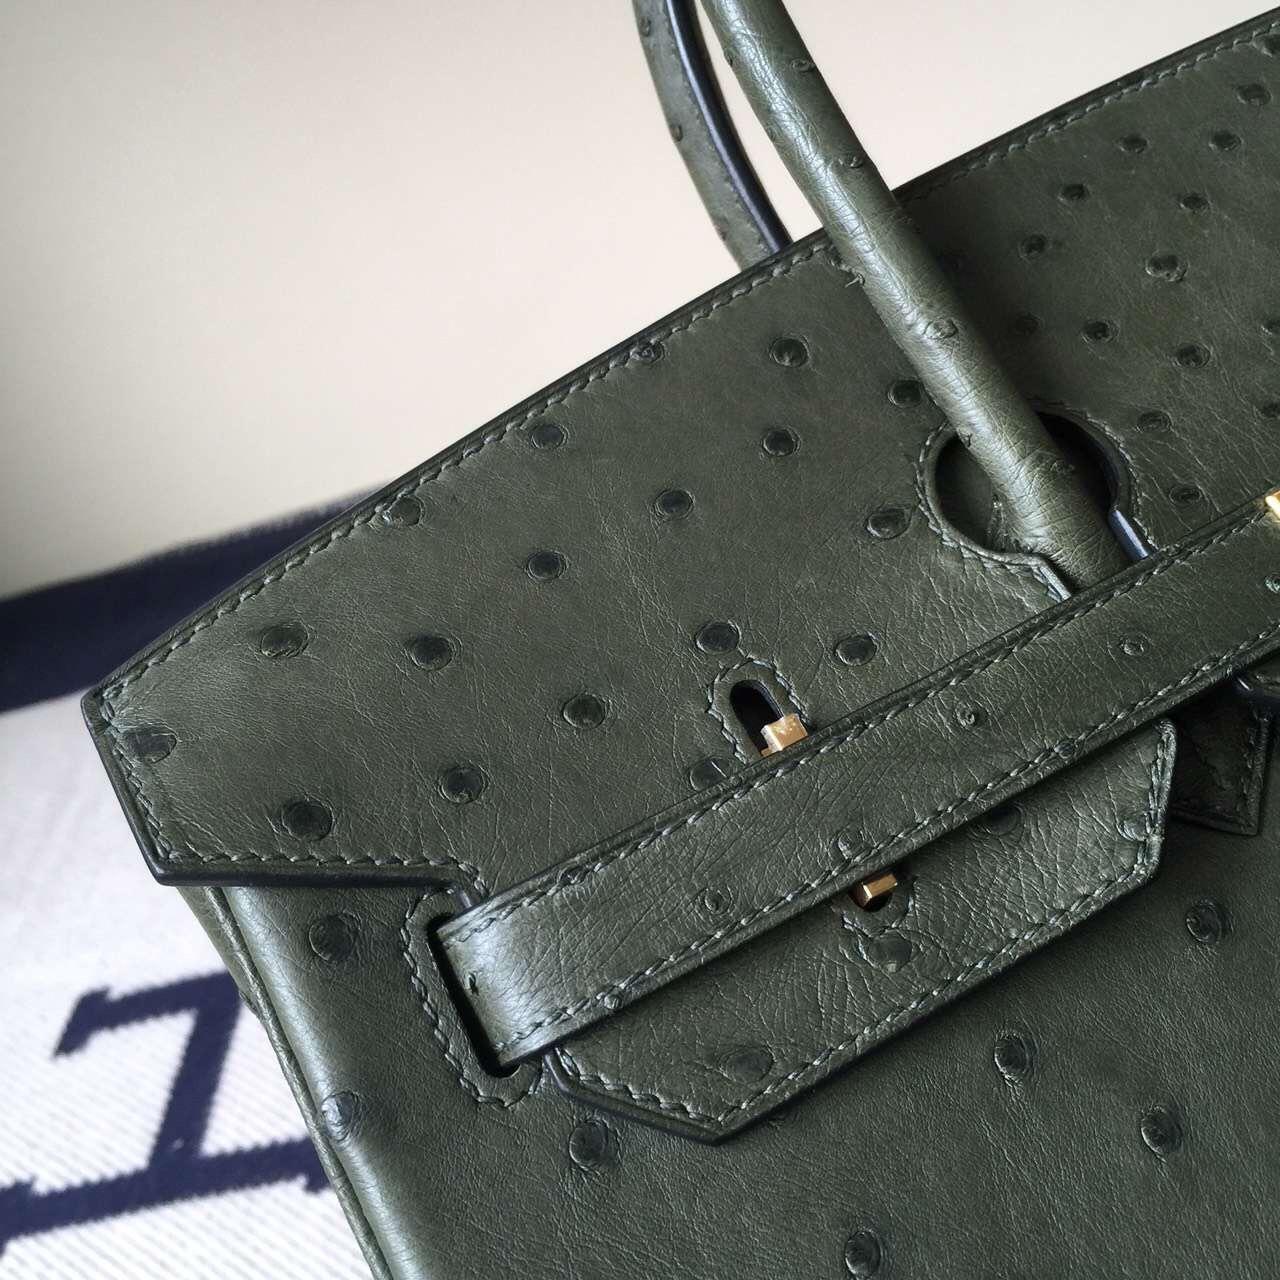 Hand Stitching Hermes V6 Canopee Green Ostrich Leather Birkin Bag35cm